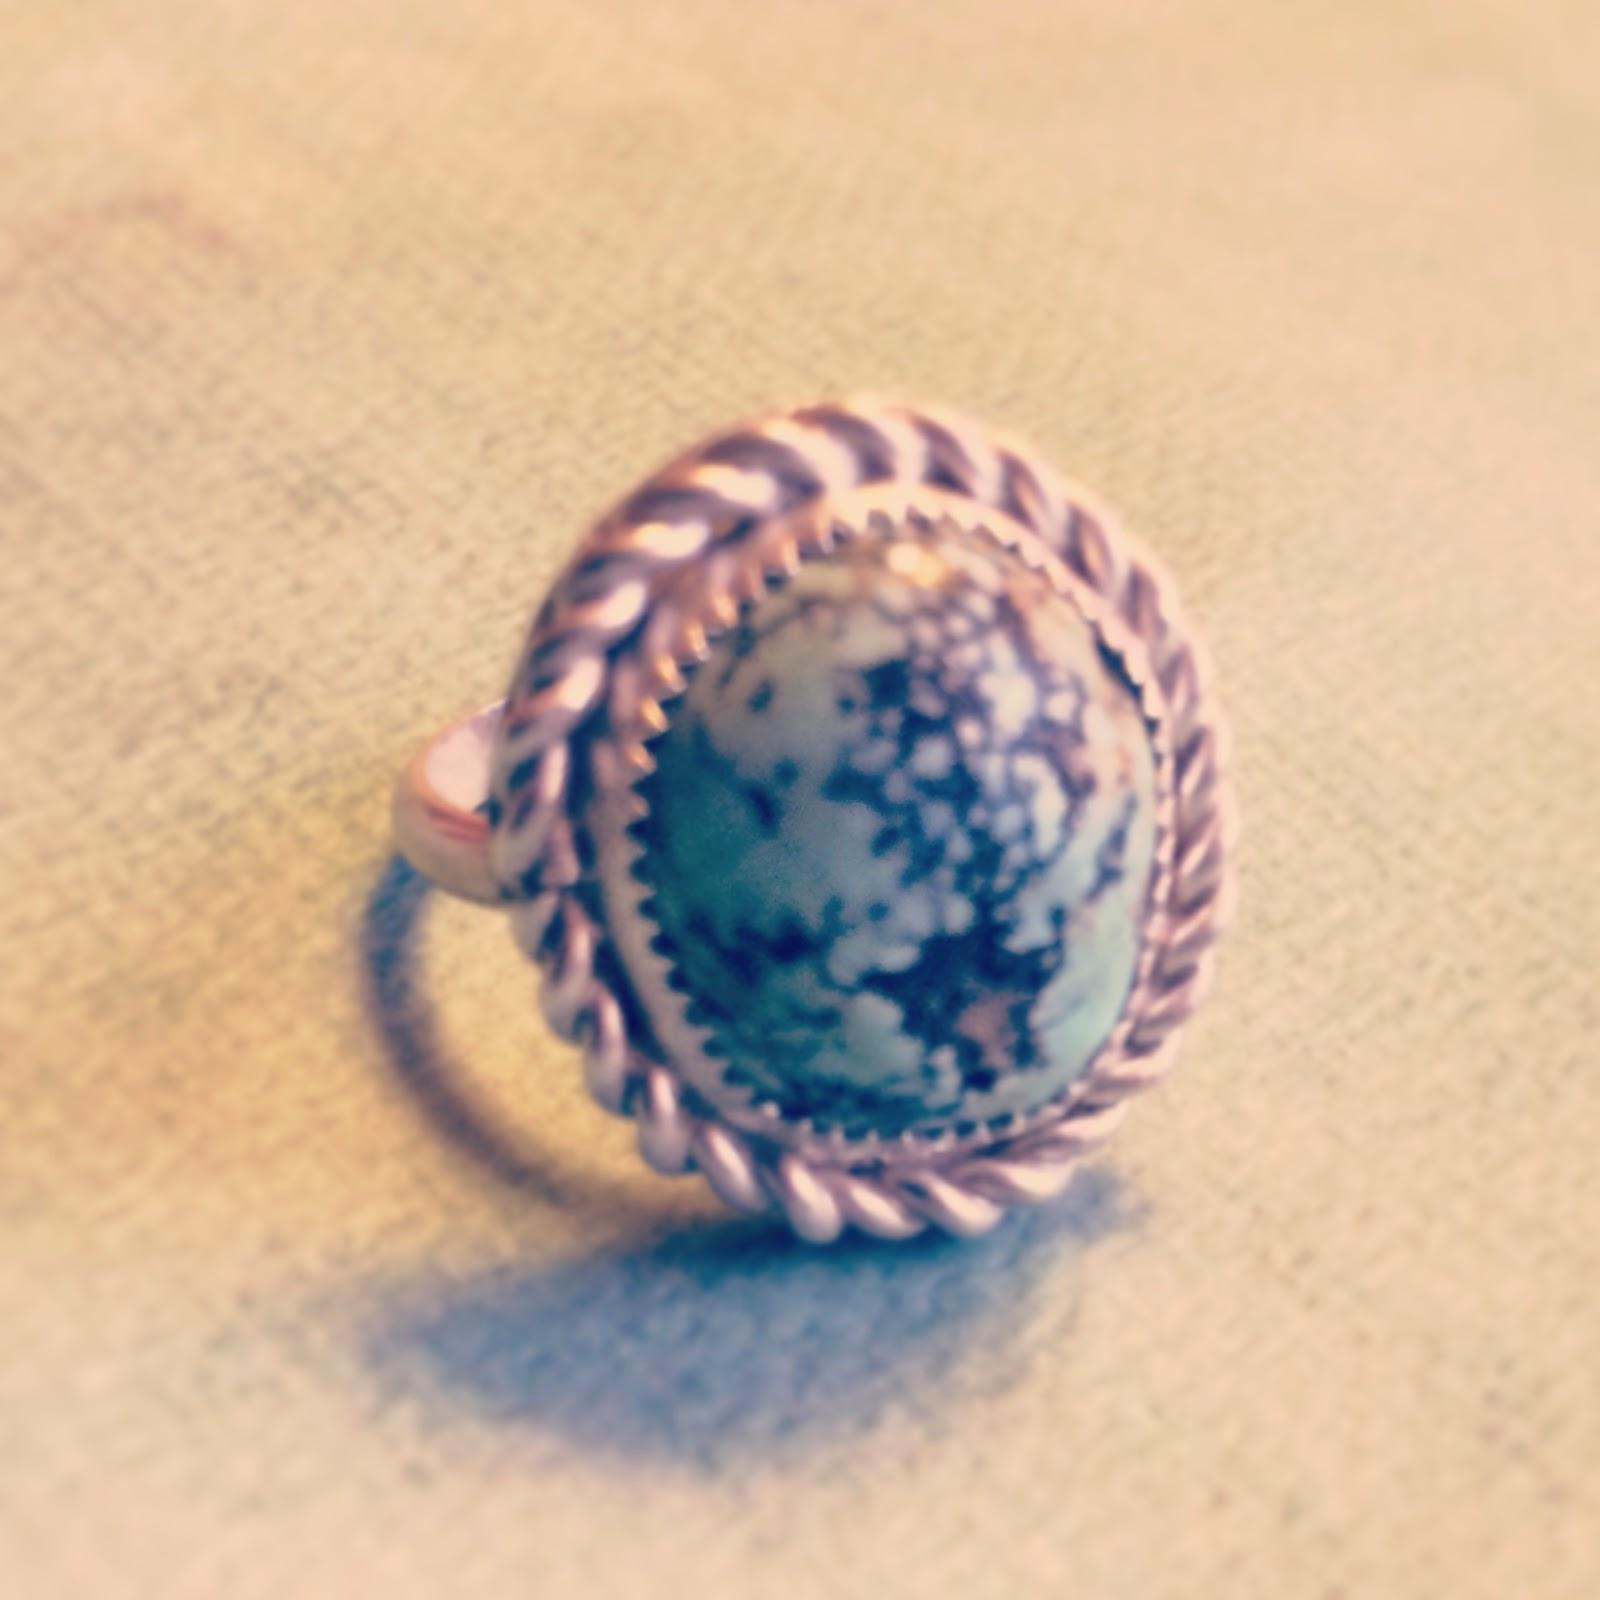 Wedding Rings Phoenix 75 Vintage Denise made this ring